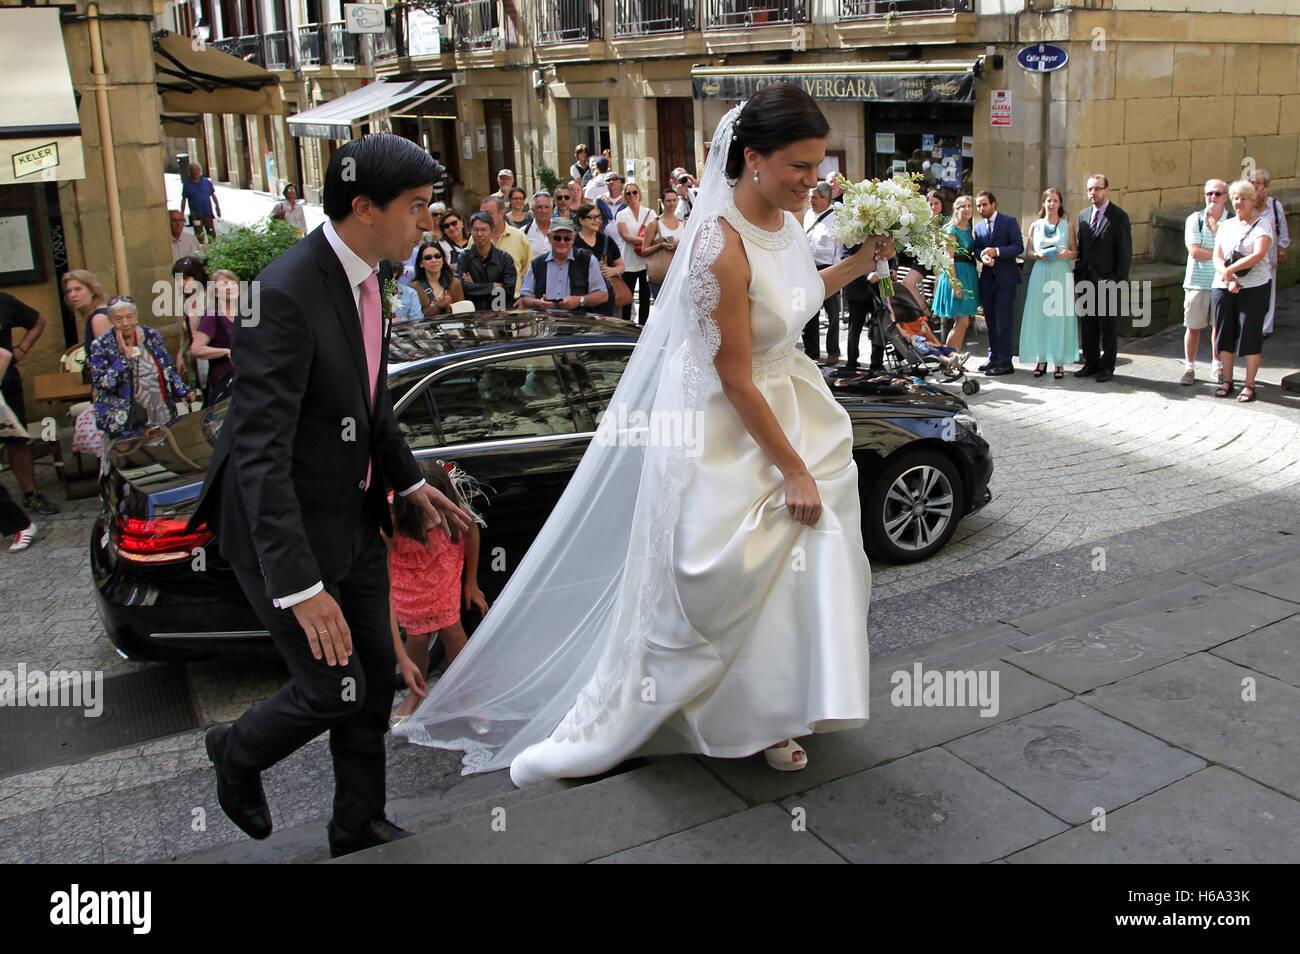 Spanish wedding San Sebastian Donostia Spain - Stock Image